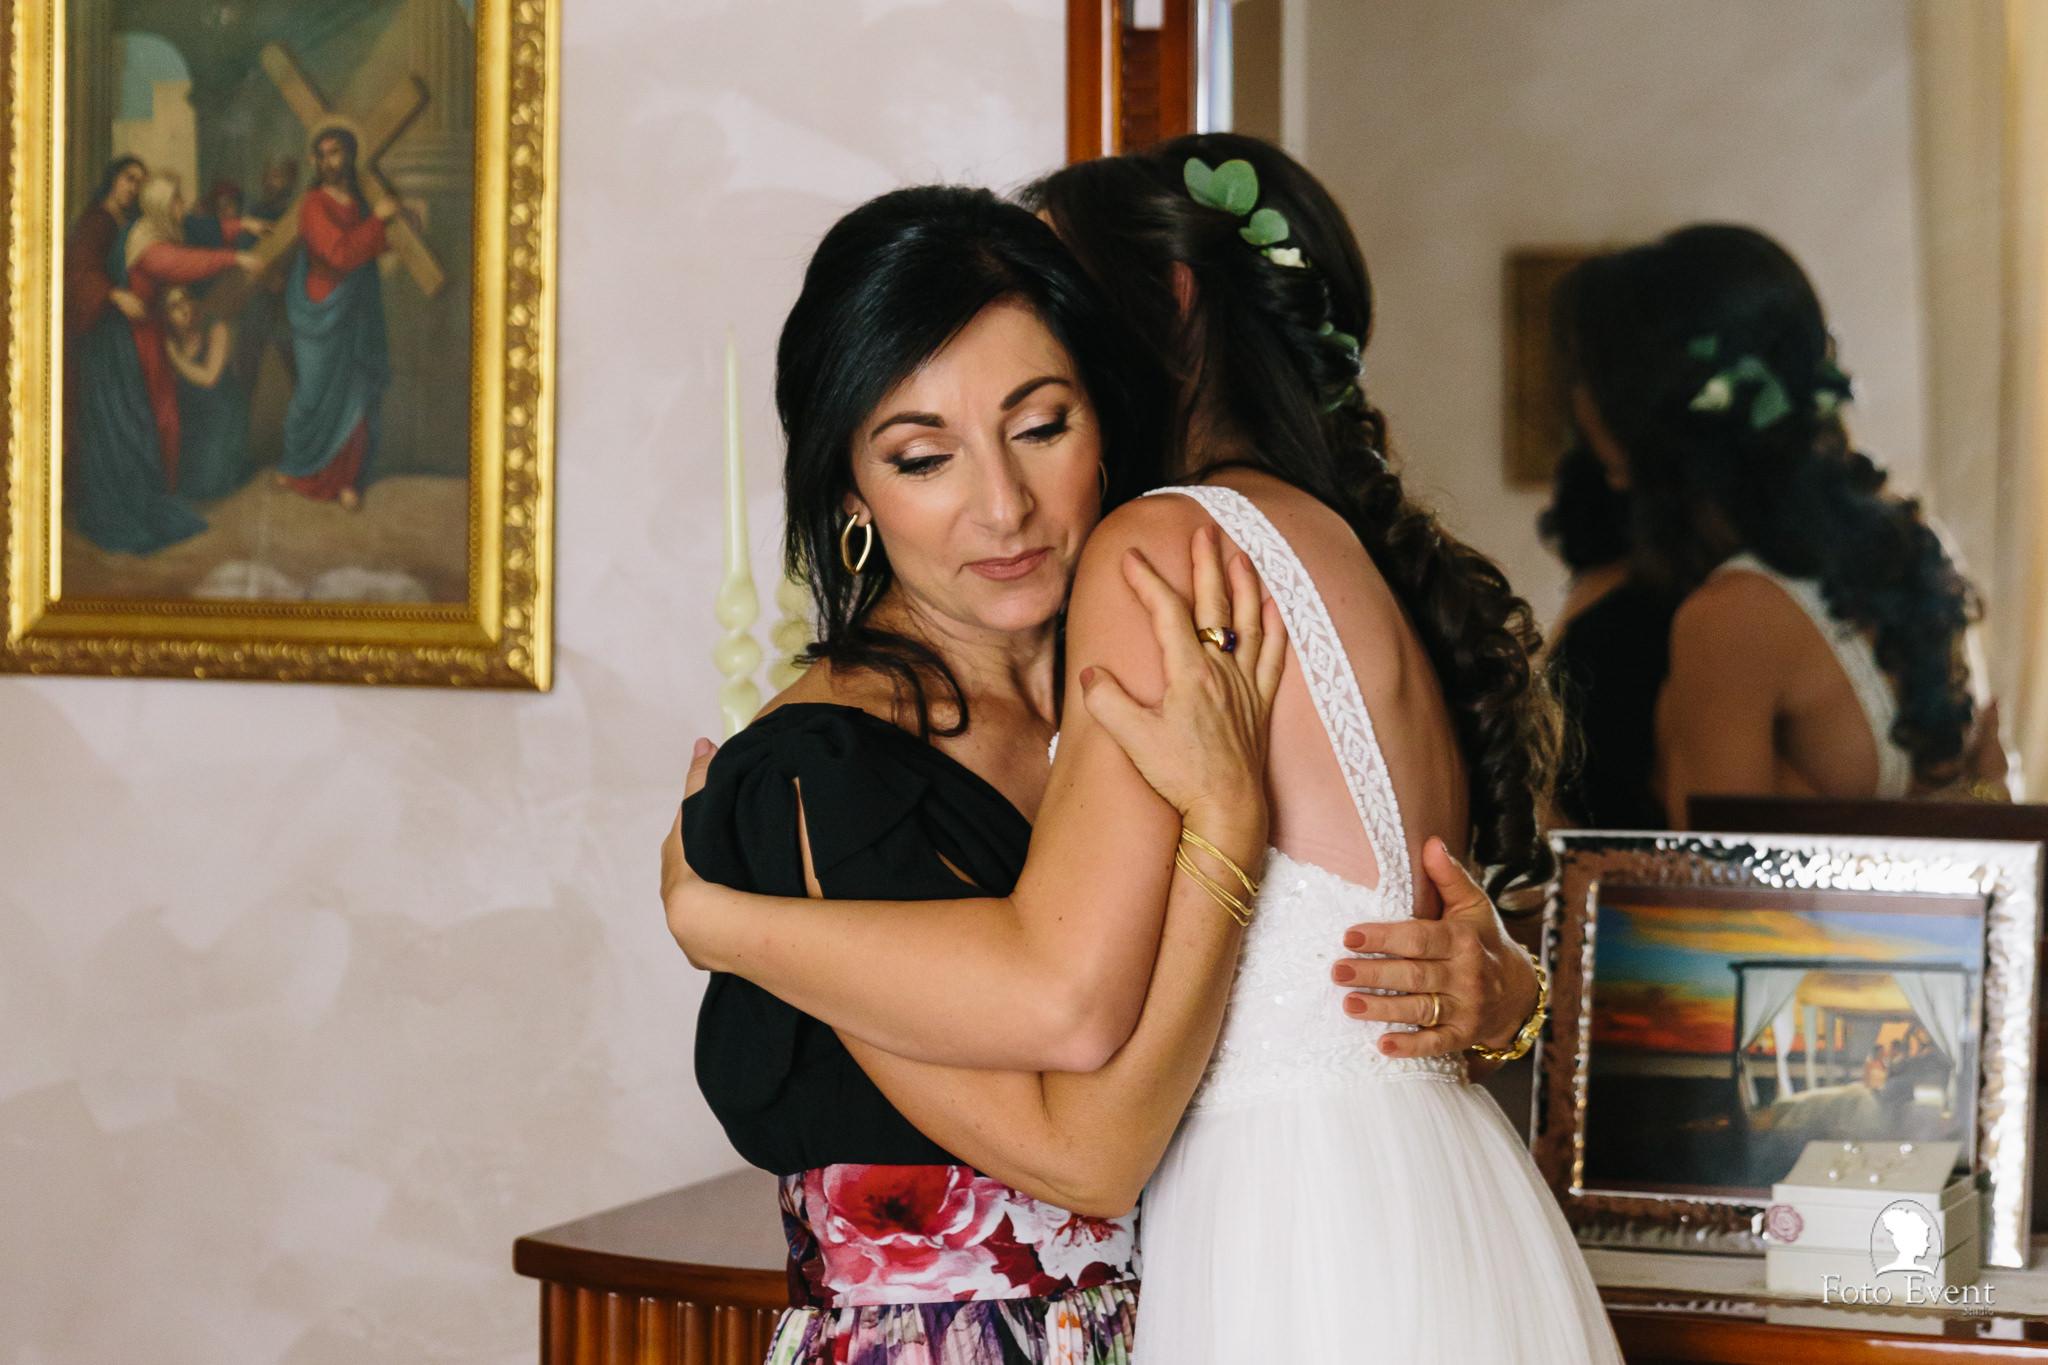 012-2019-08-23-Matrimonio-Lucia-e-Rosario-Scopelliti-5DE-605